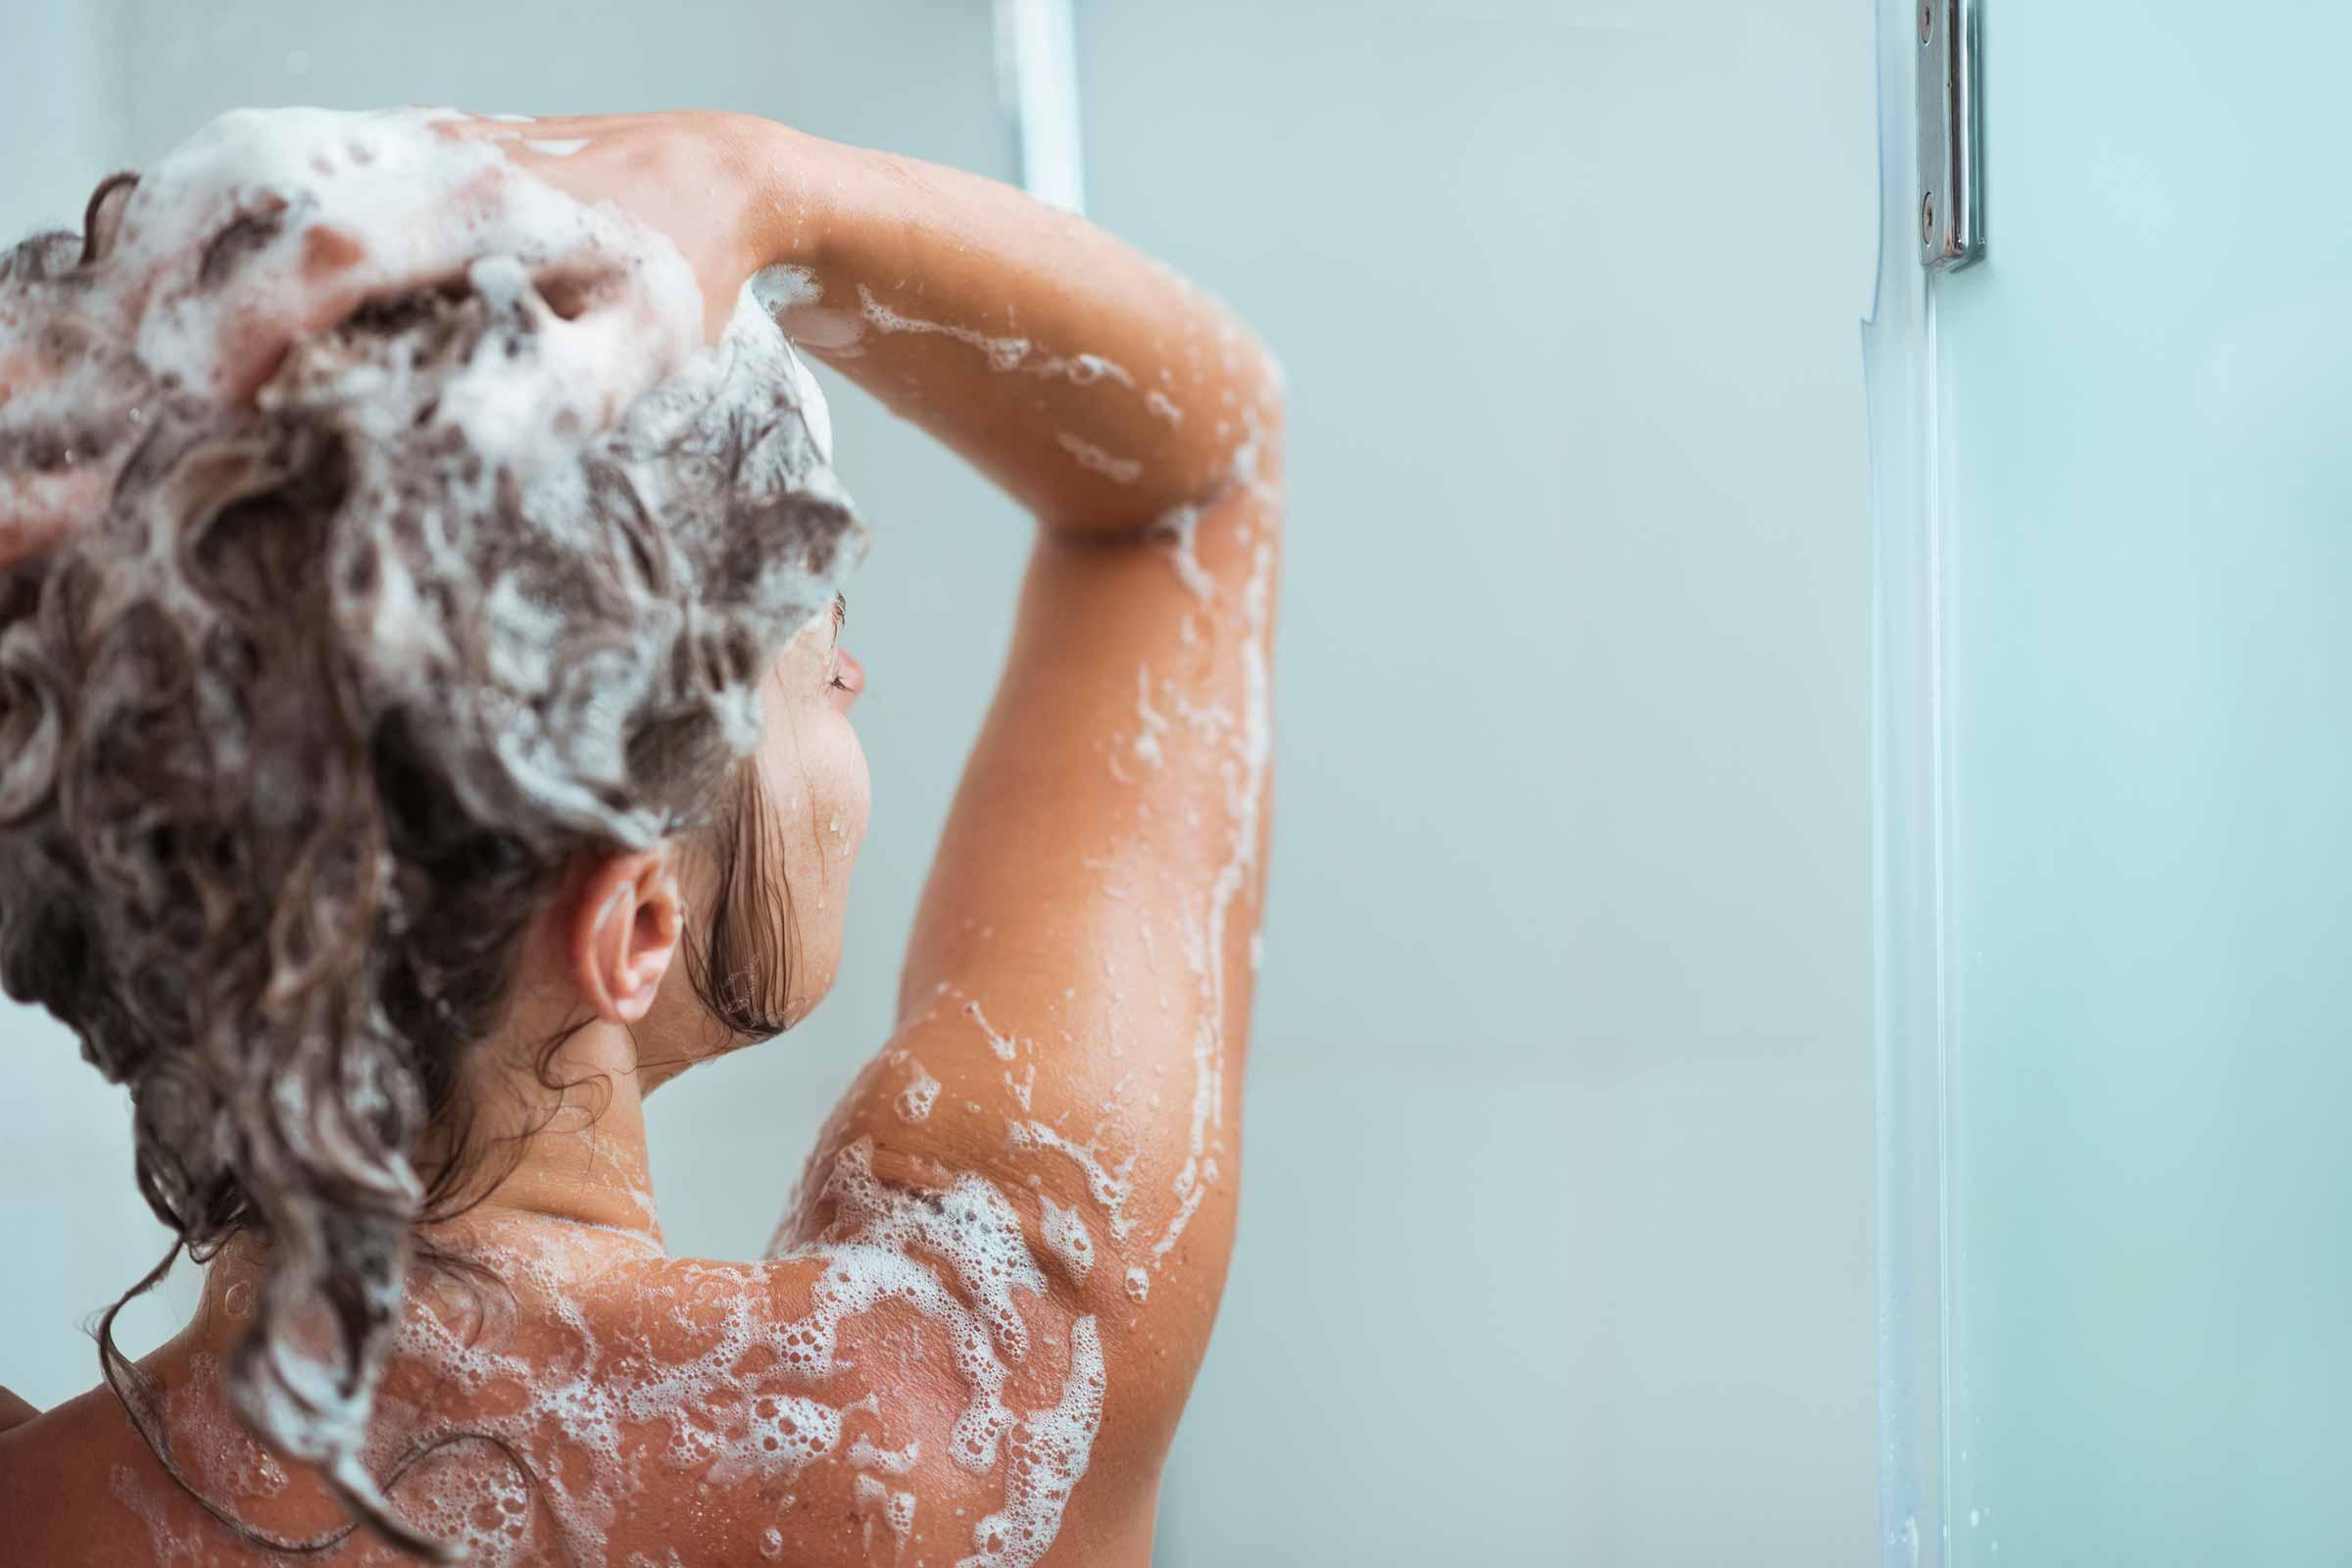 Hypoallergenic Shampoo For Sensitive Skin